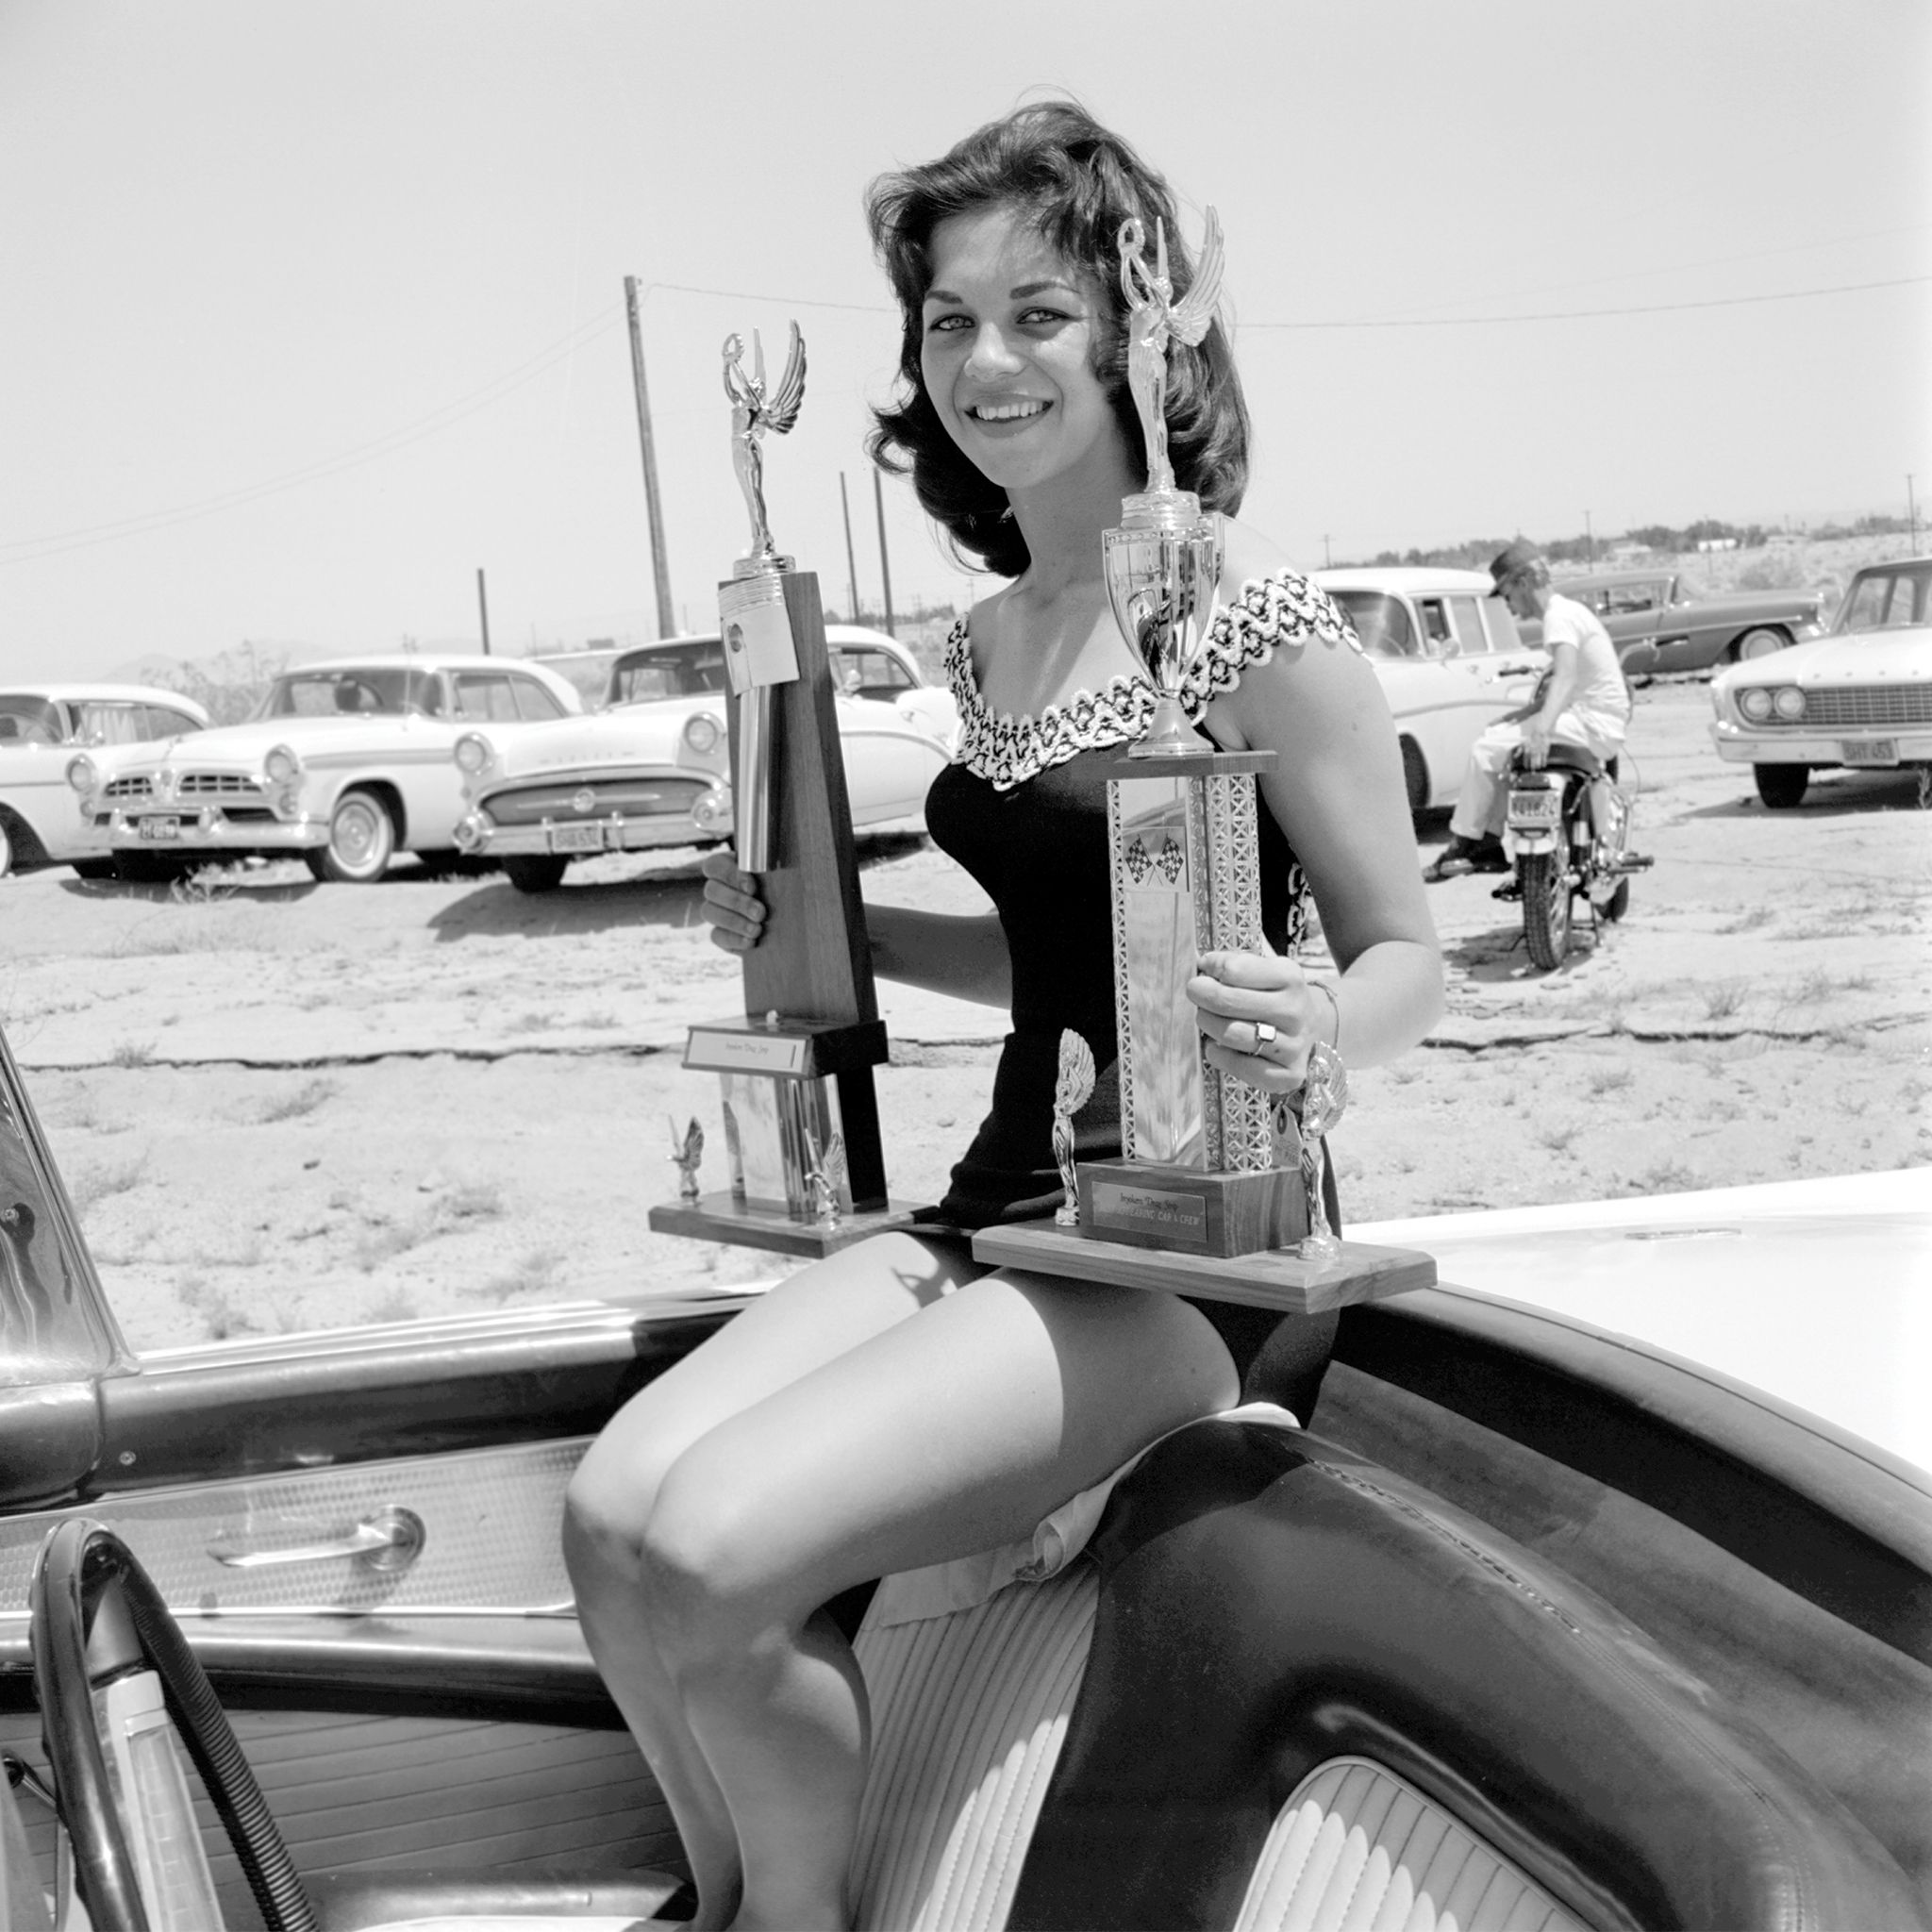 trophy-girl-1961-dust-devils-inyokern-drag-strip-1.jpg